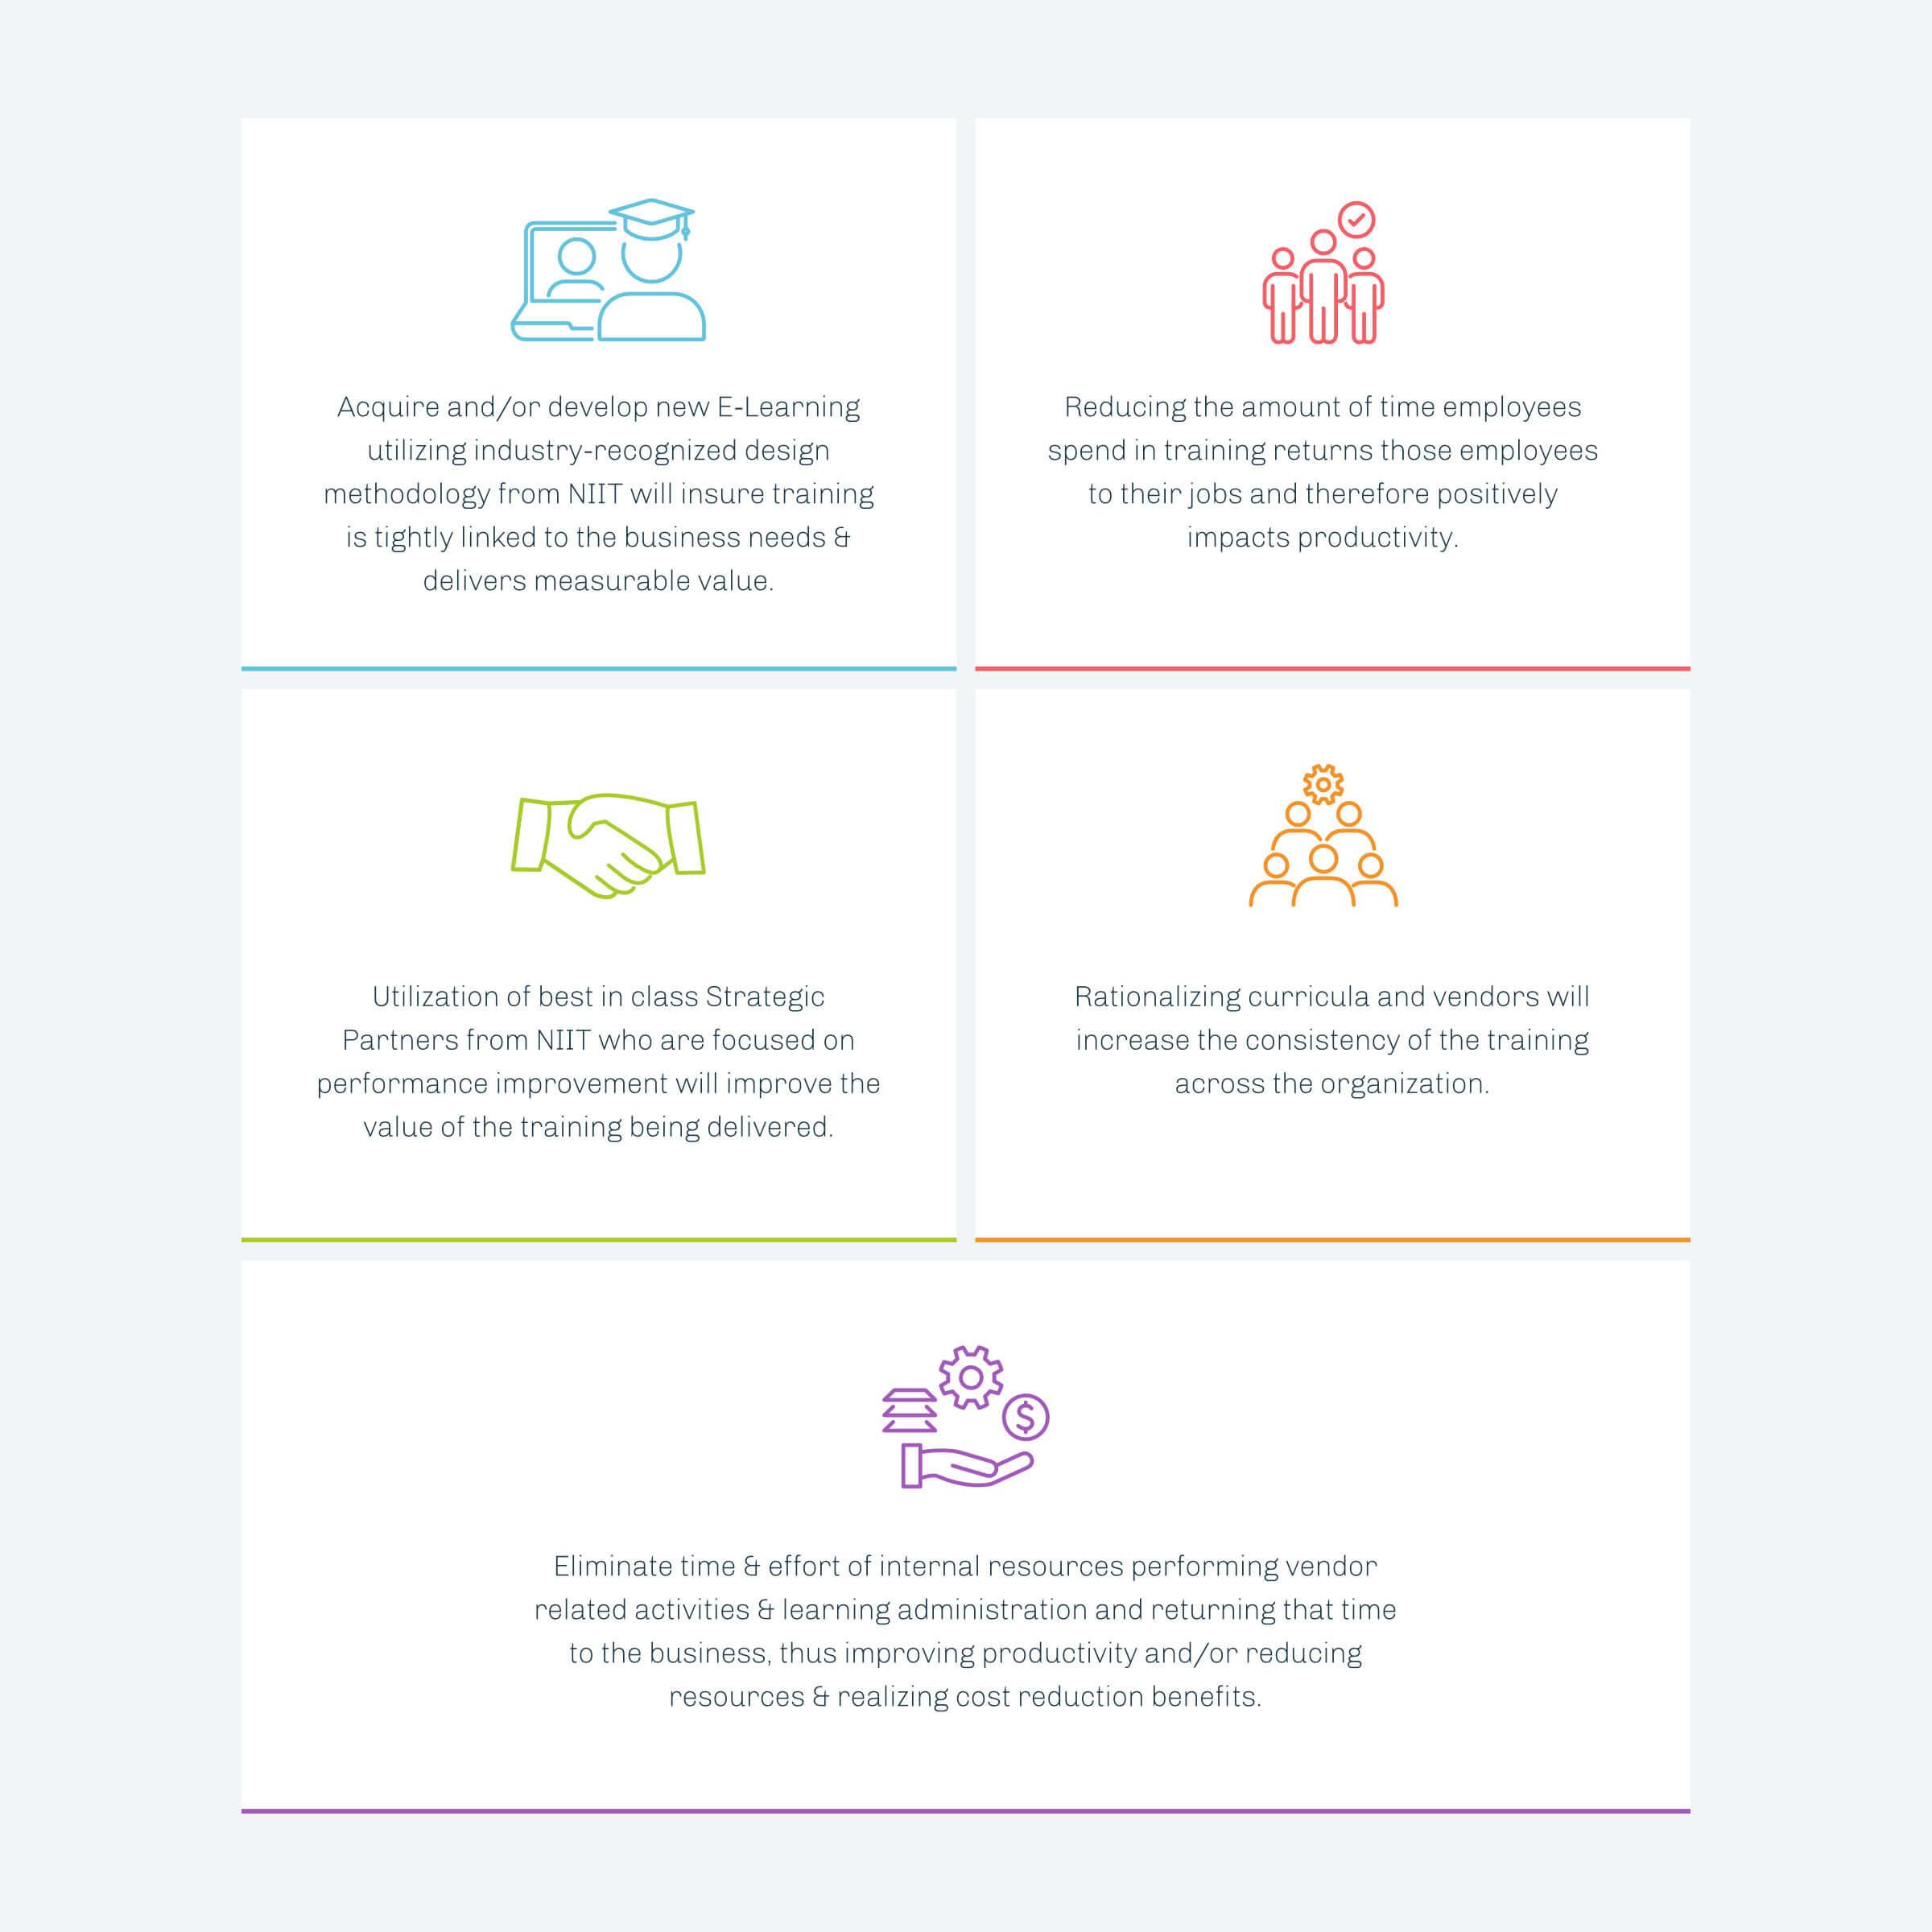 Strategic Sourcing, Vendor Management - NIIT